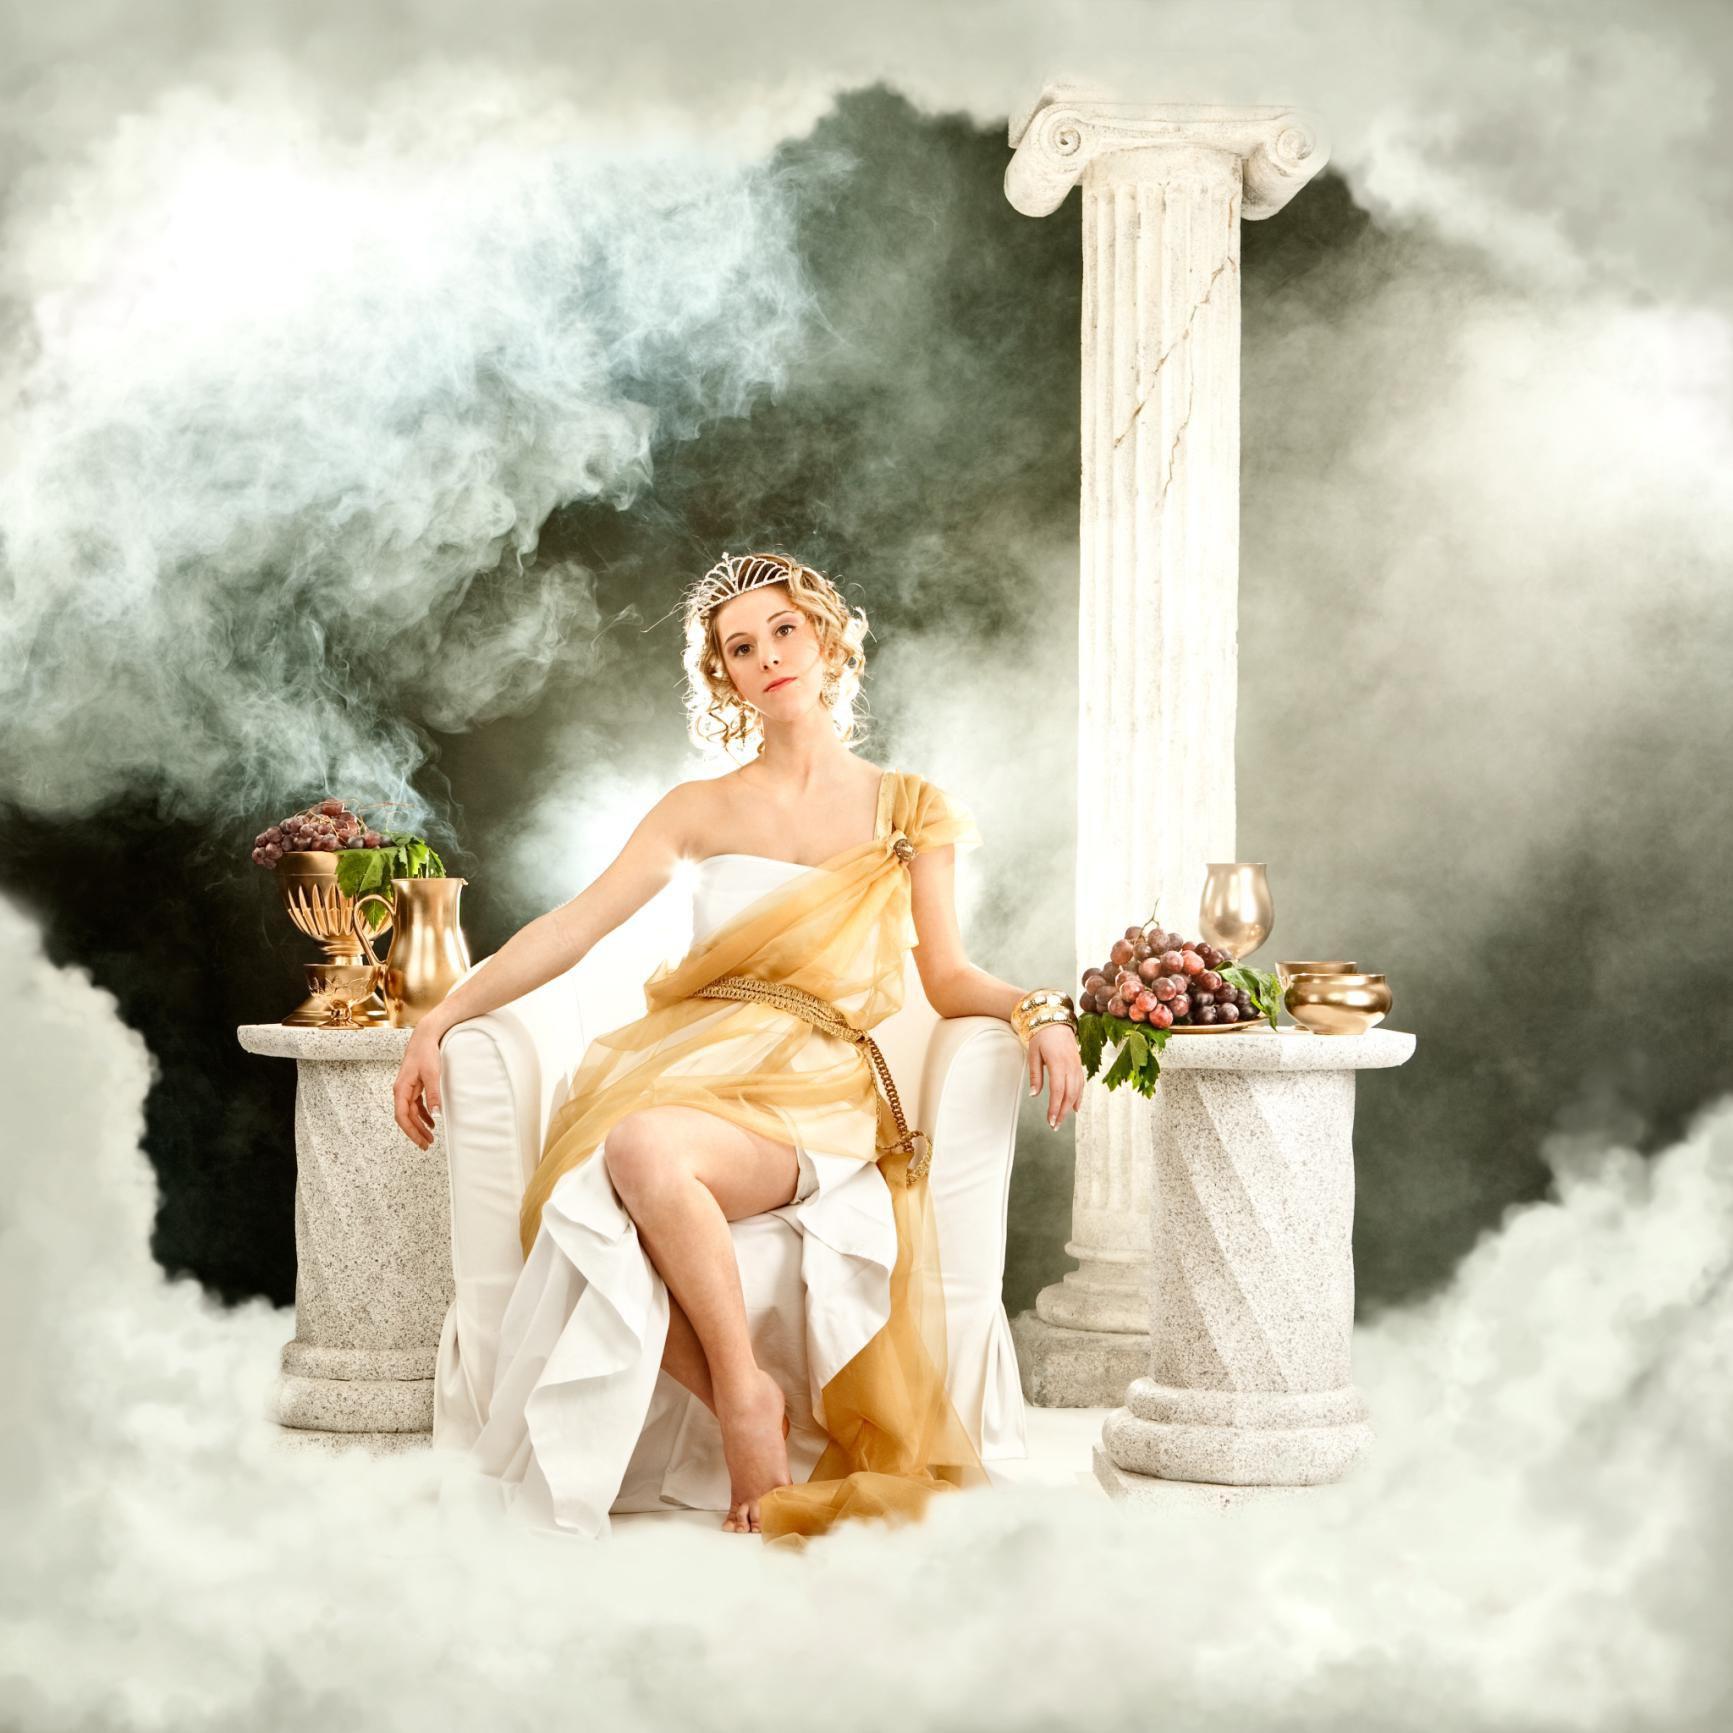 the relationship between zeus and hera the ancient greek gods